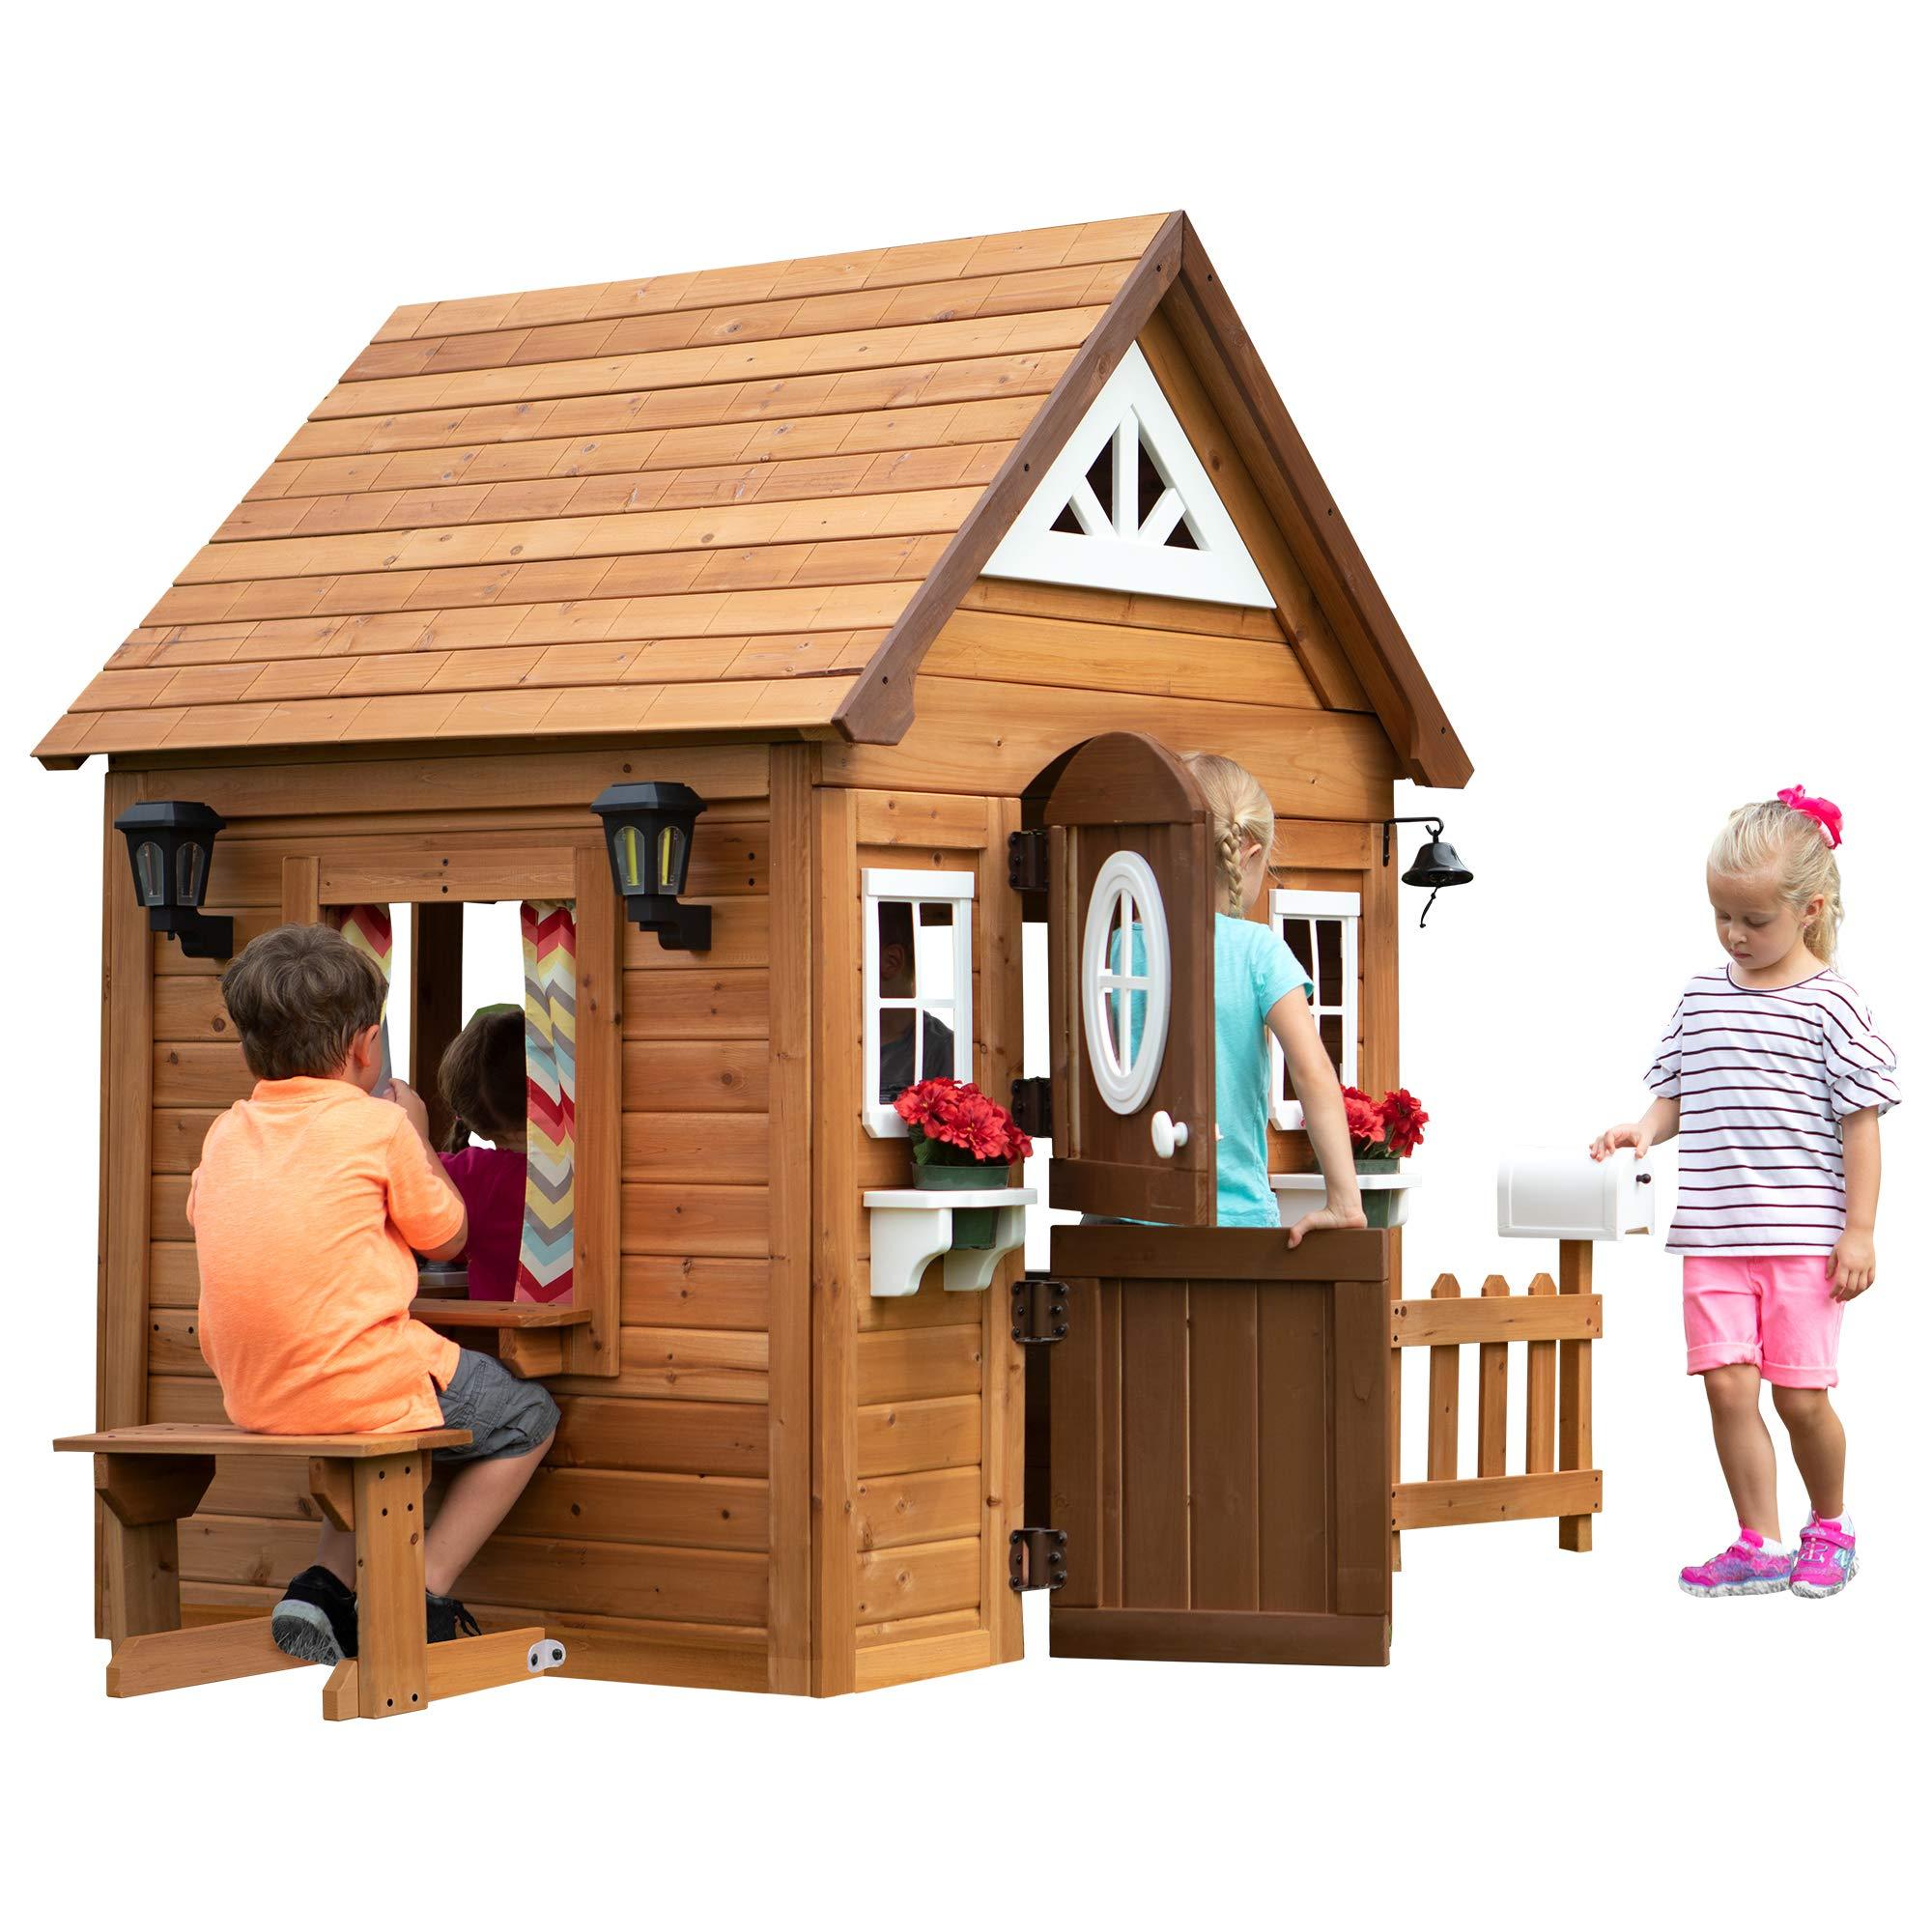 Backyard Discovery Aspen All Cedar Outdoor Wooden Playhouse by Backyard Discovery (Image #1)